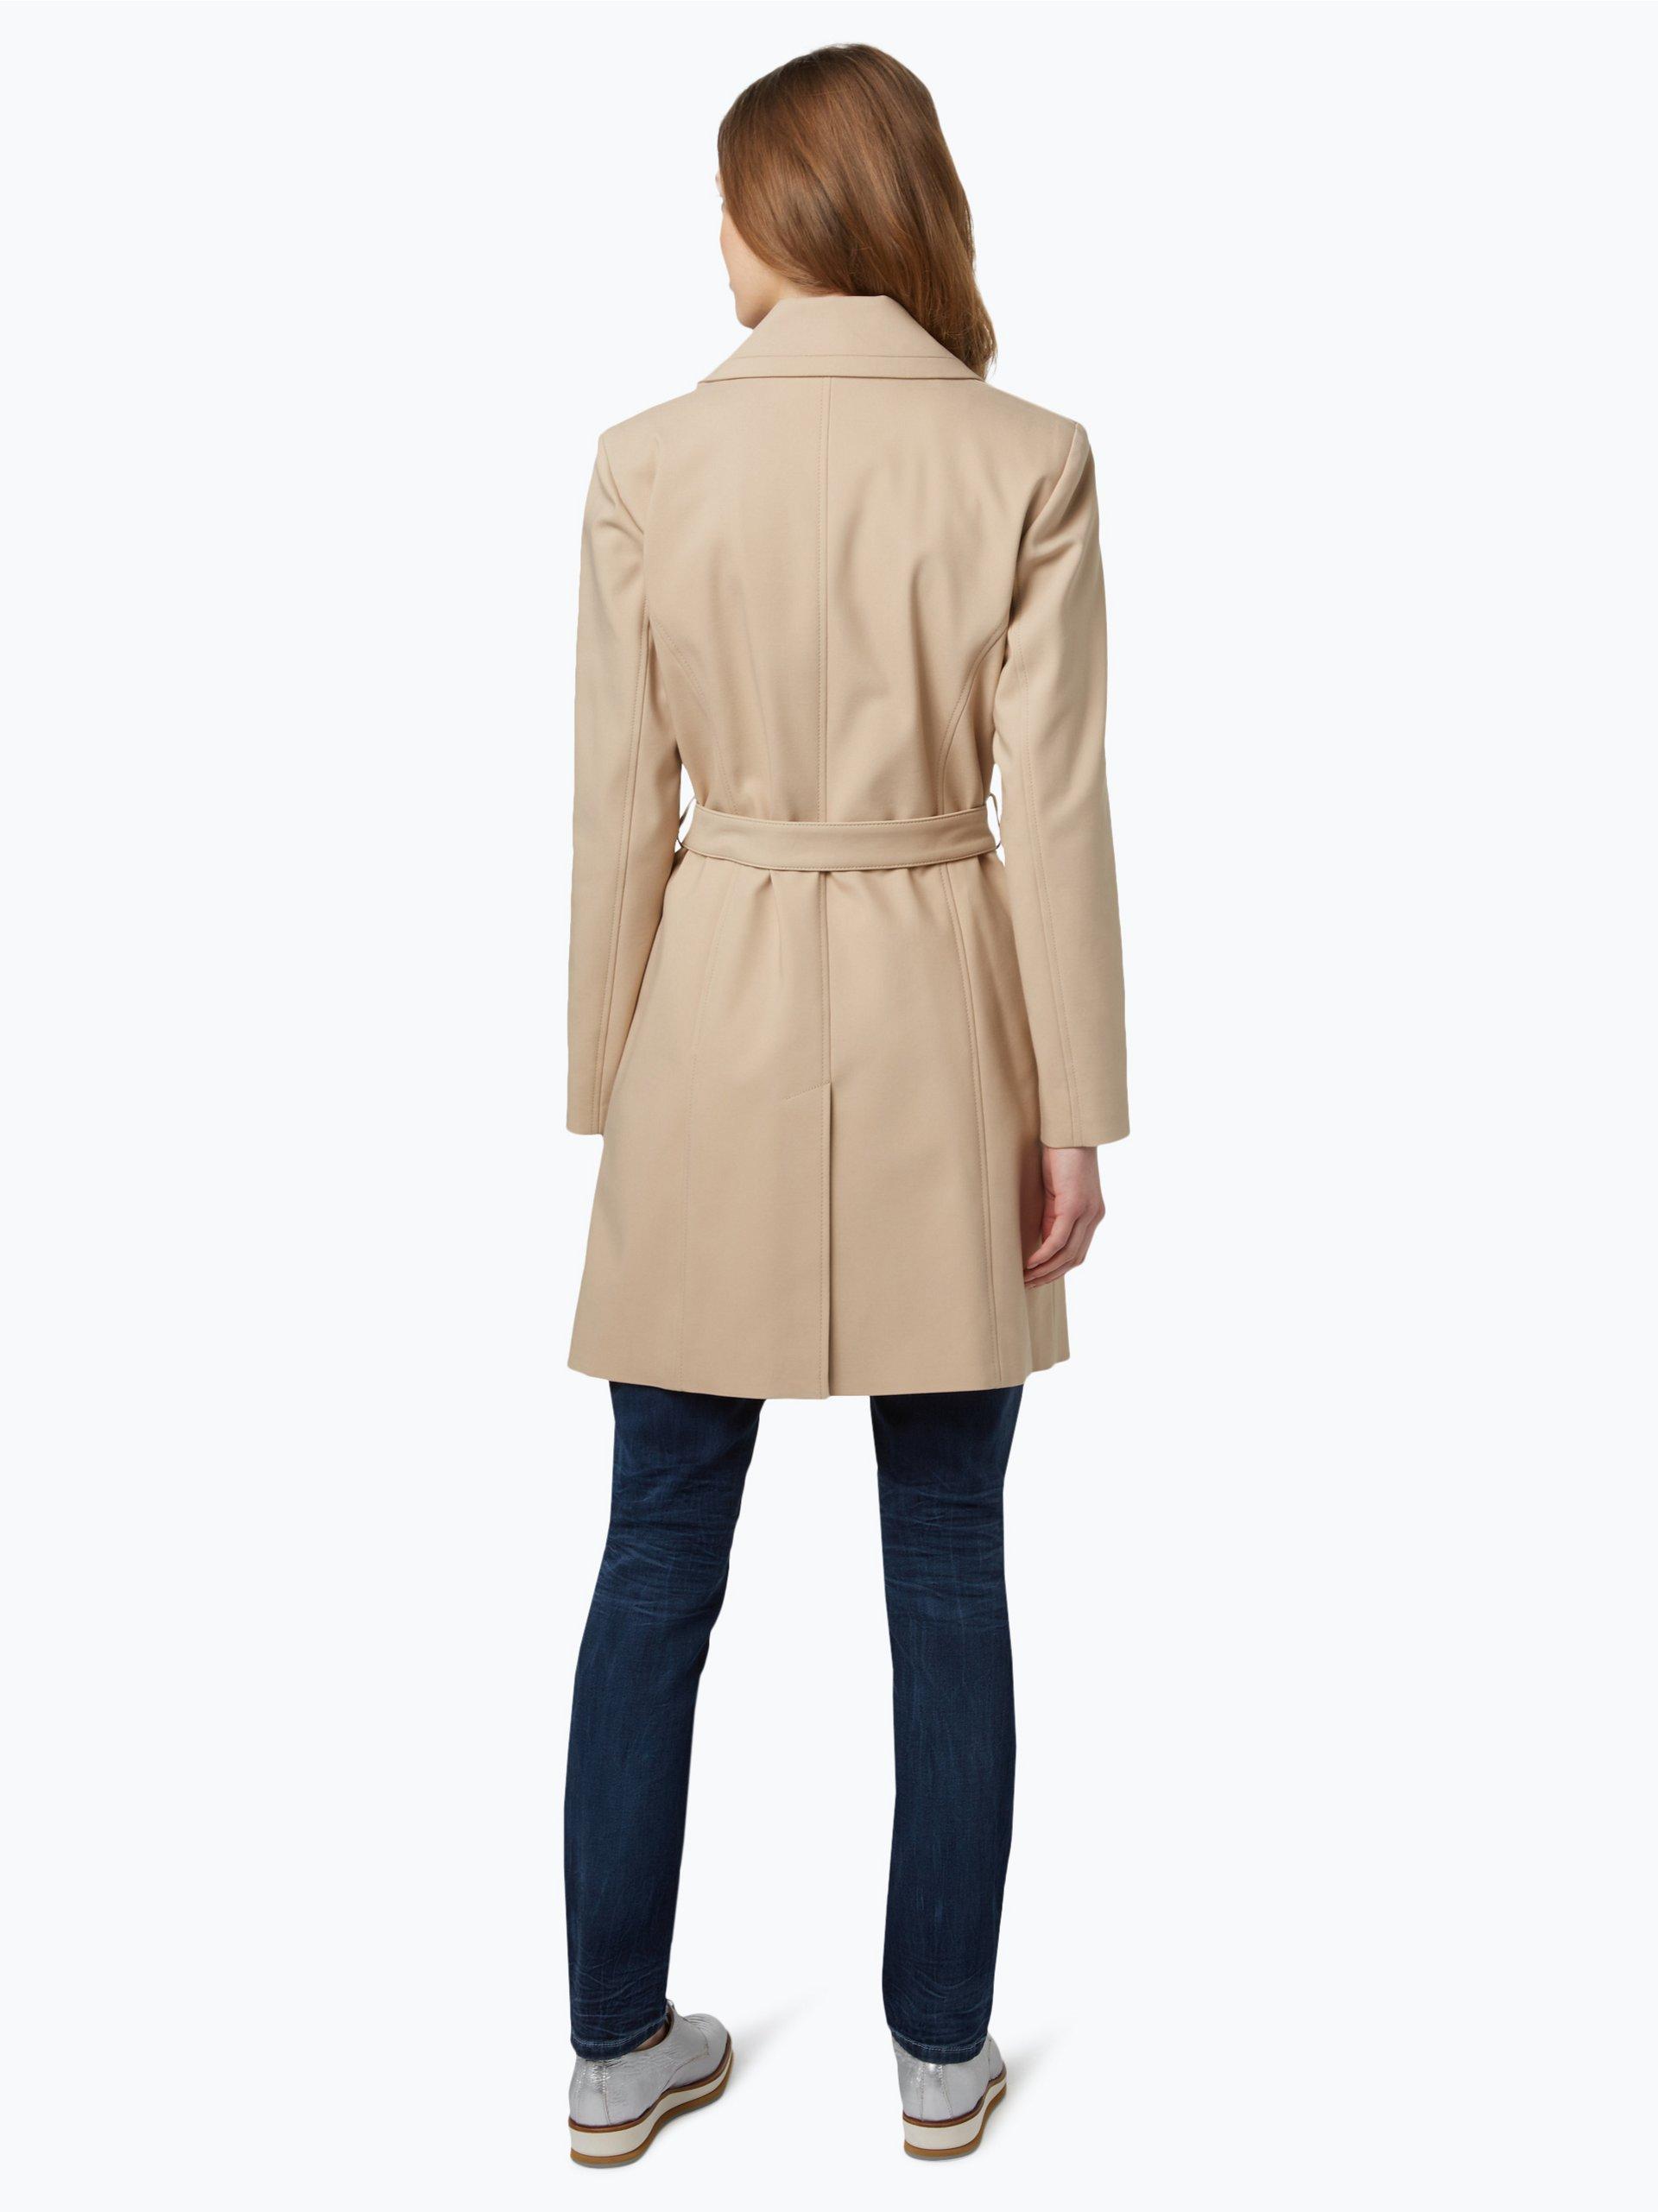 marie lund damen mantel beige uni online kaufen vangraaf com. Black Bedroom Furniture Sets. Home Design Ideas